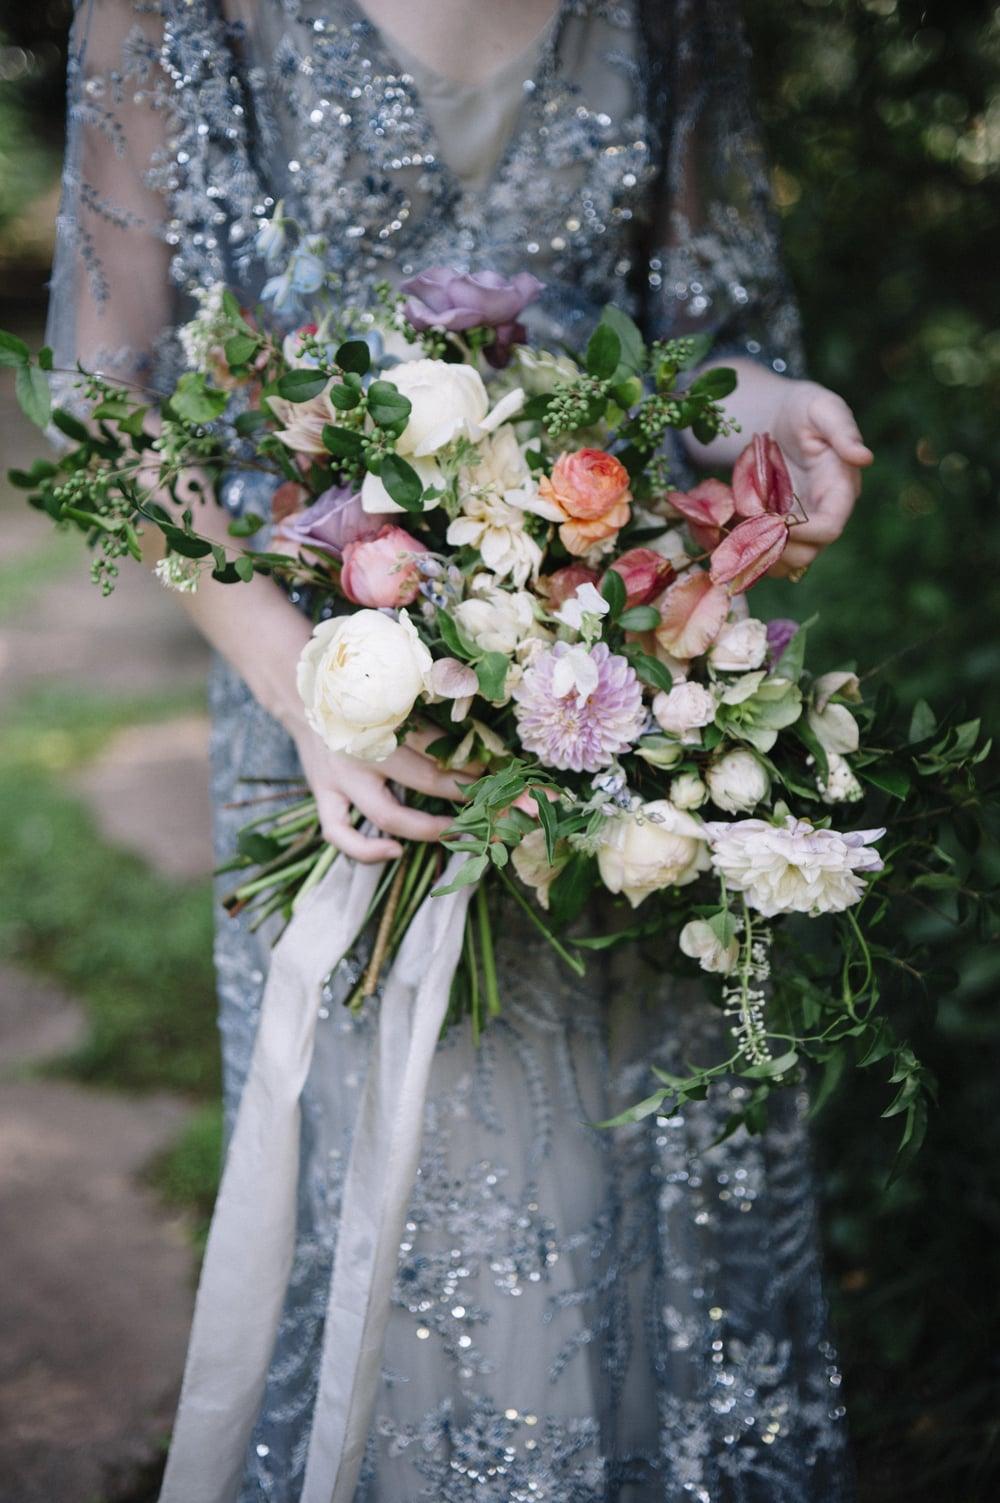 amy-osaba-events-flower-workshop-katie-hyatt-blue-dress-pink-flowers-bouquet40.jpg